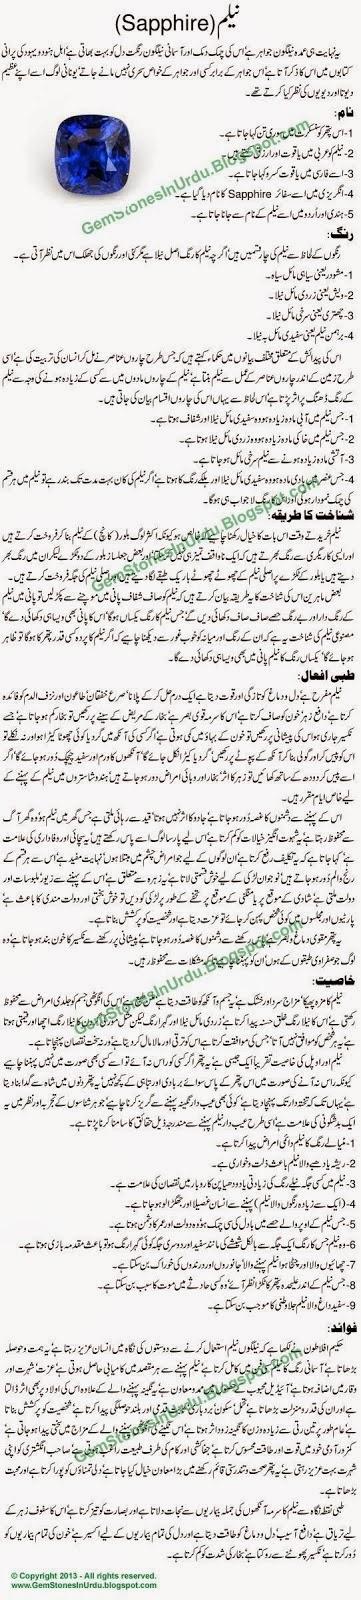 Amethyst Stone Benefits In Urdu Gemstones In Islam Lucky Stone For ...